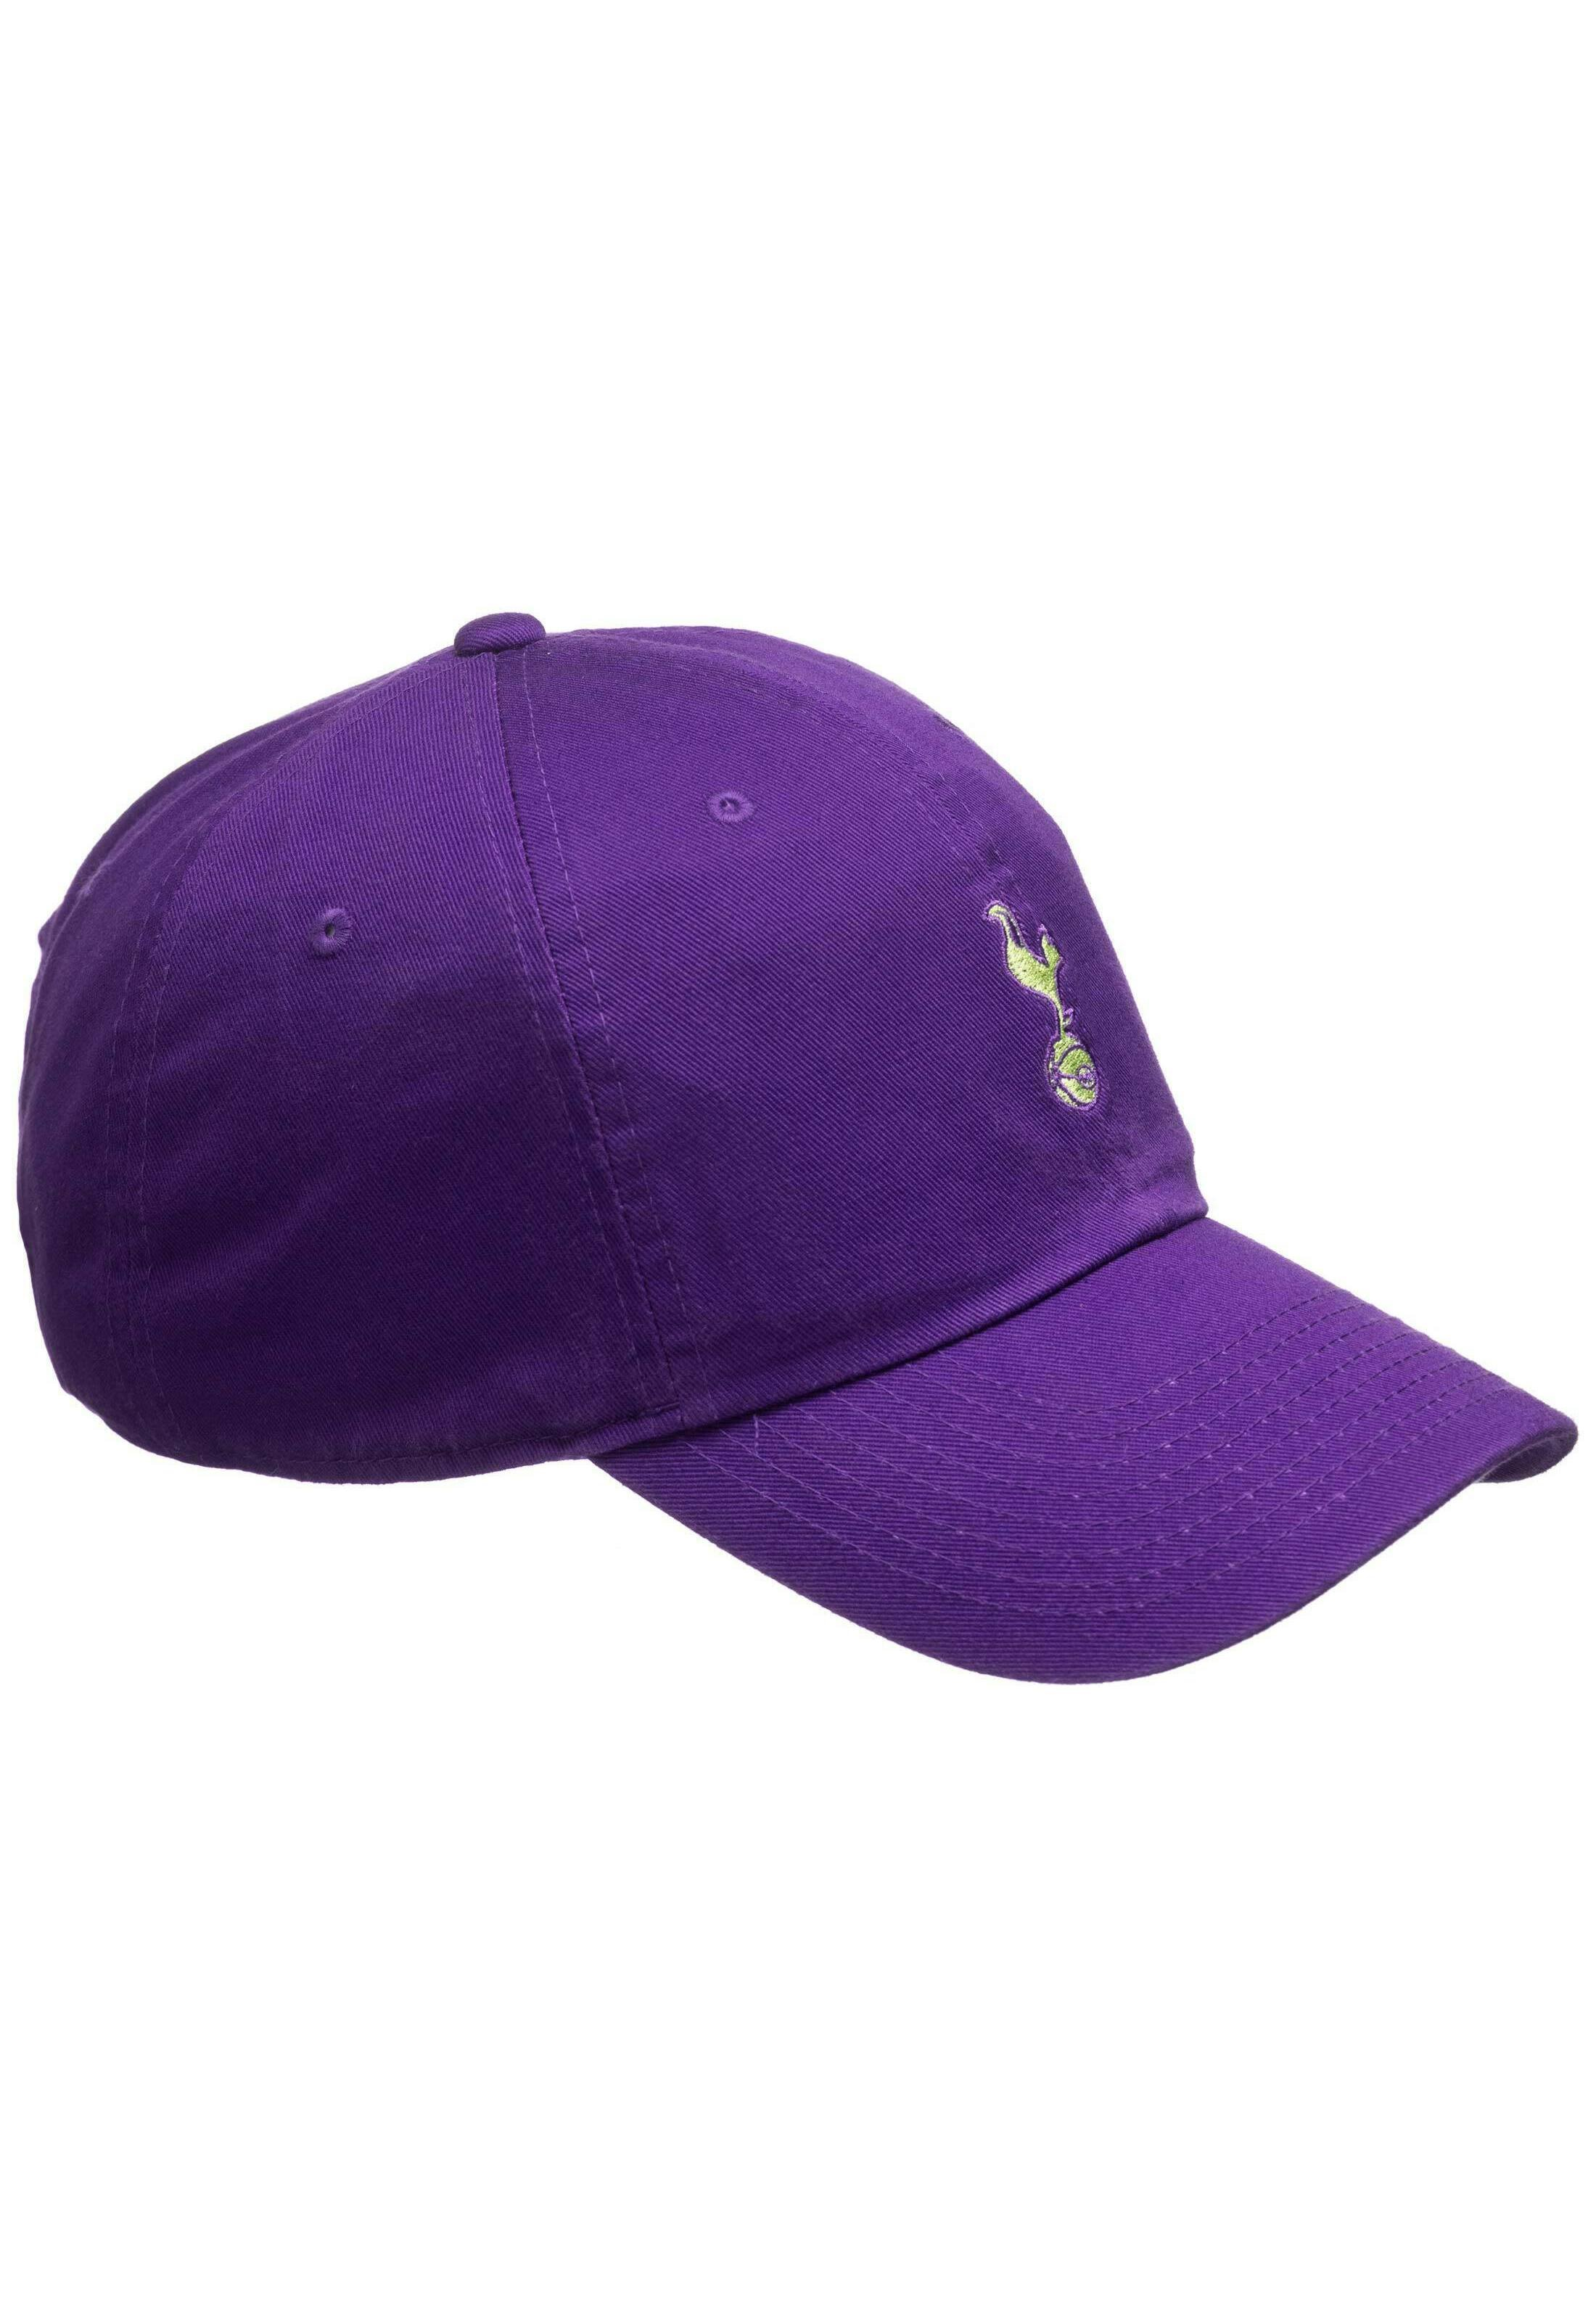 Femme Casquette -  purple